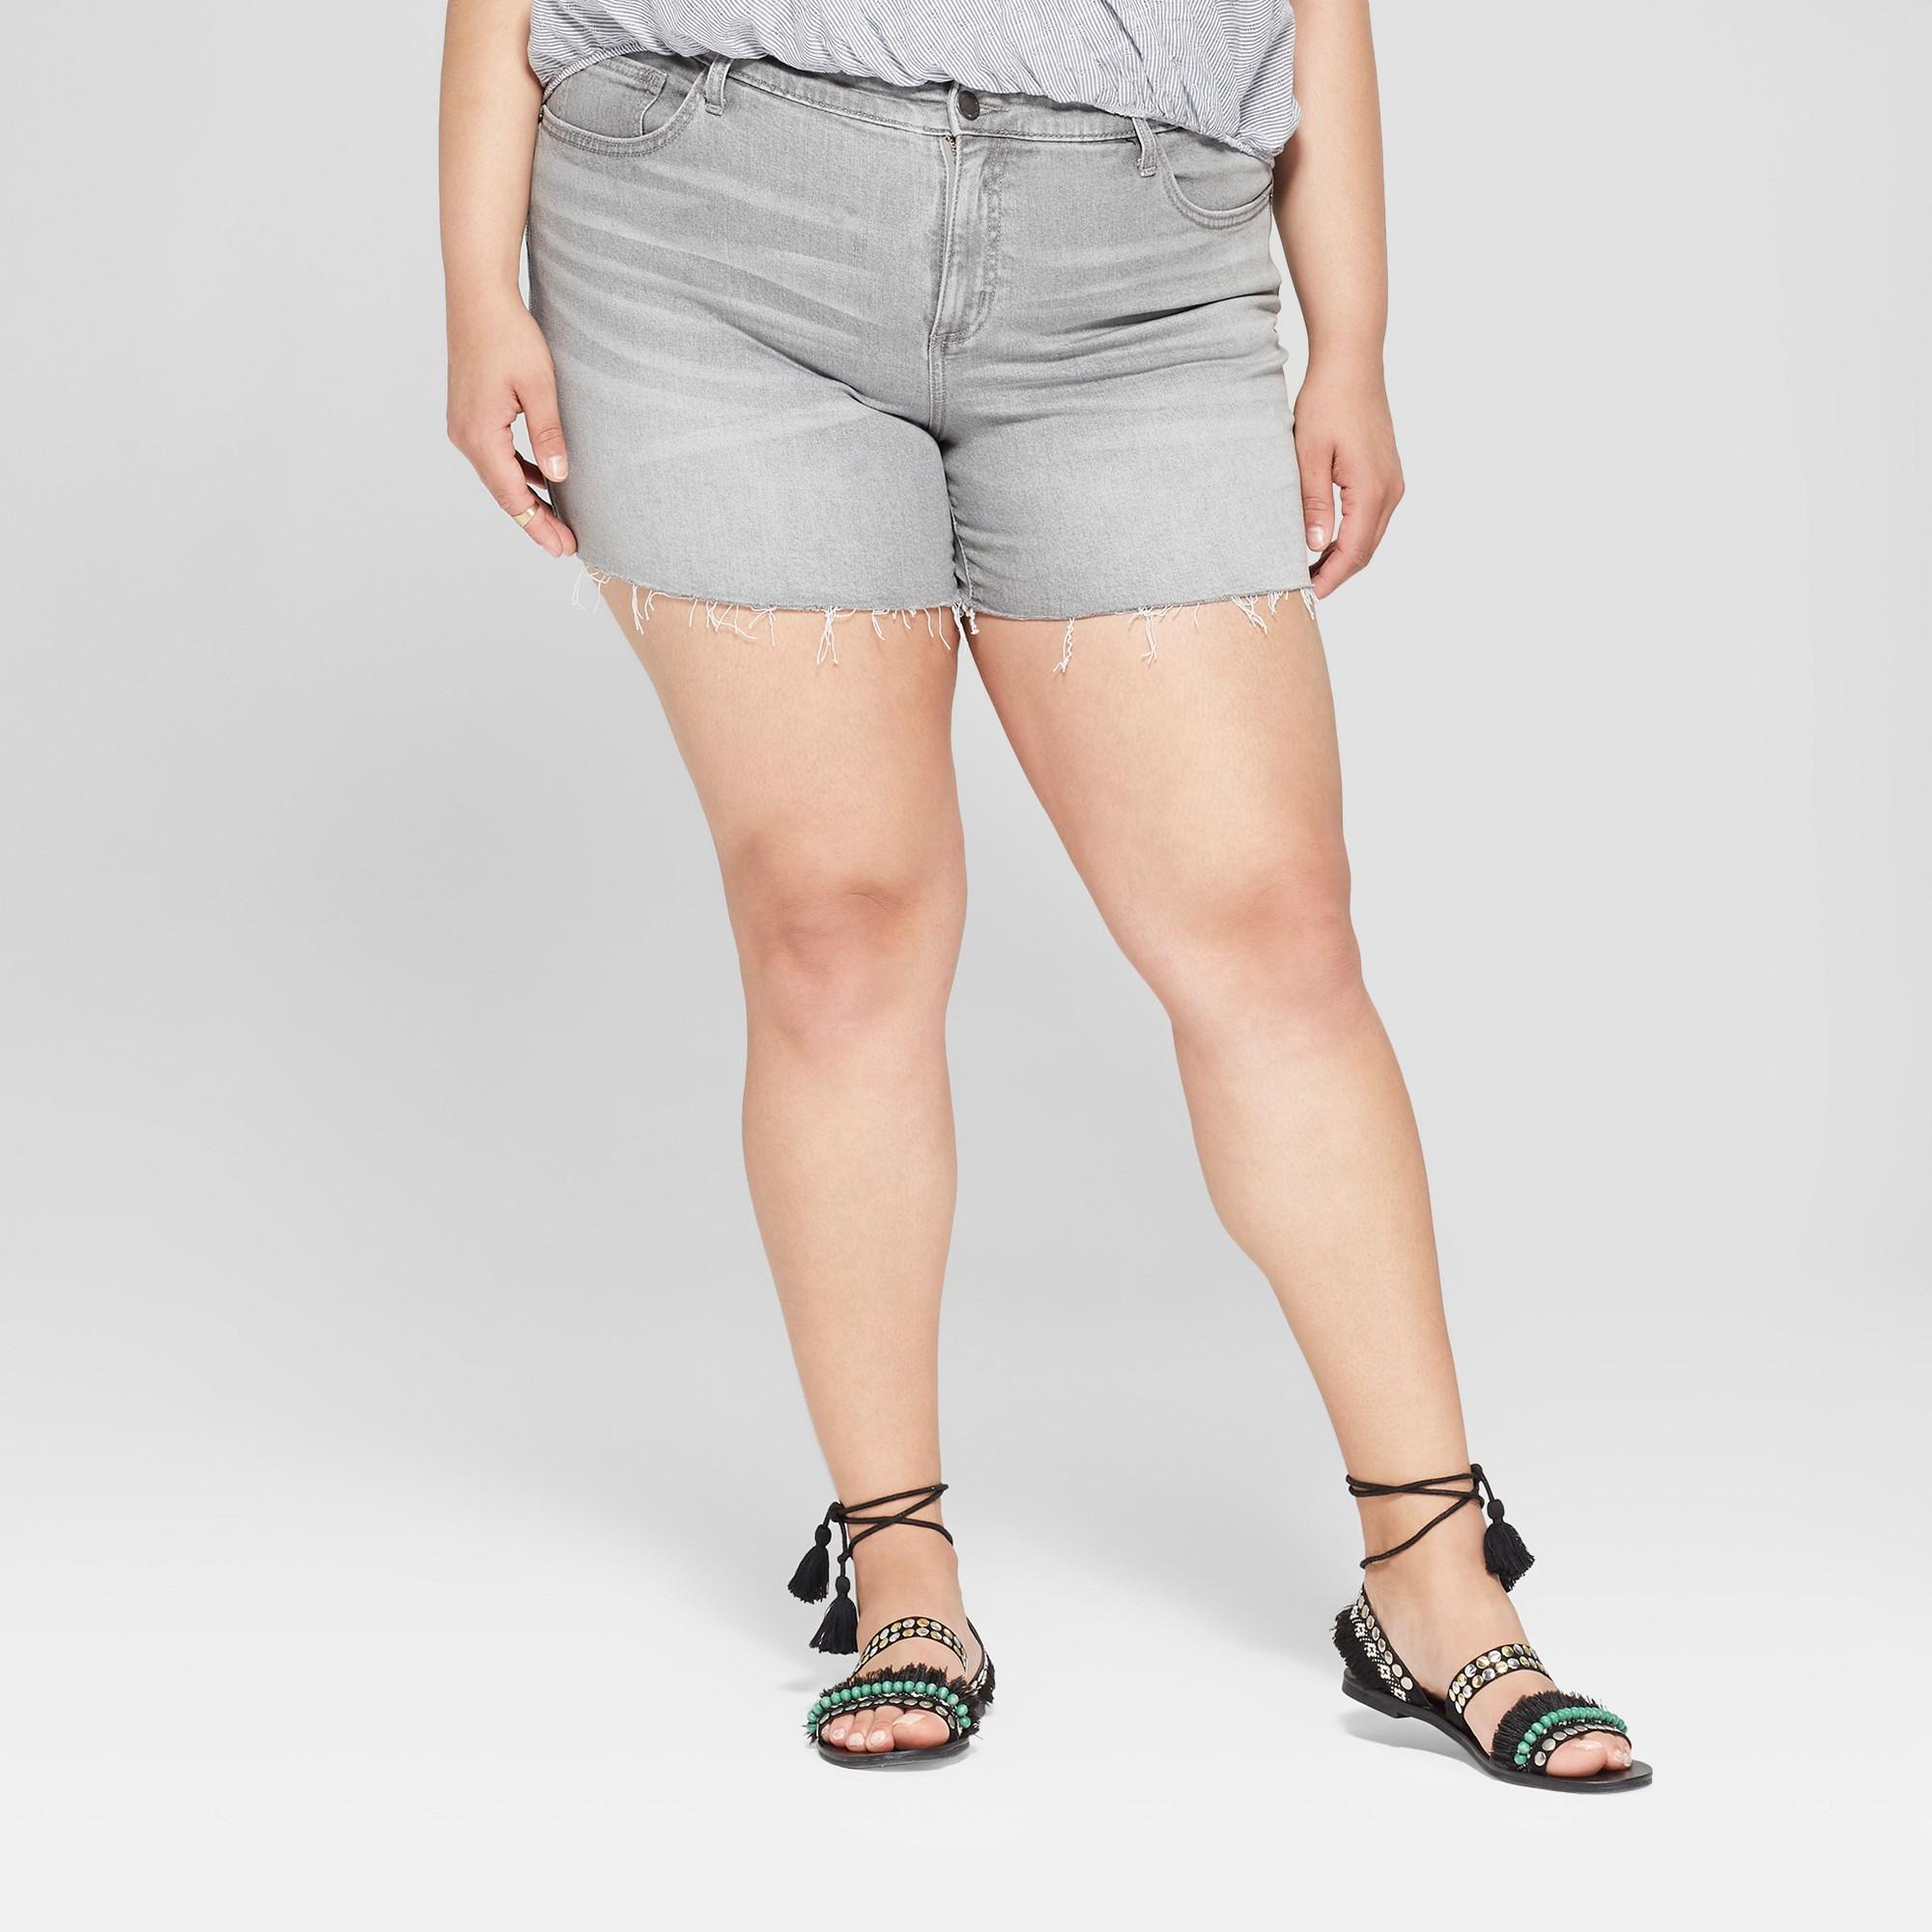 8892549dba0d6d Women's Plus Size Raw Hem Boyfriend Shorts - Universal Thread Gray Wash 14W